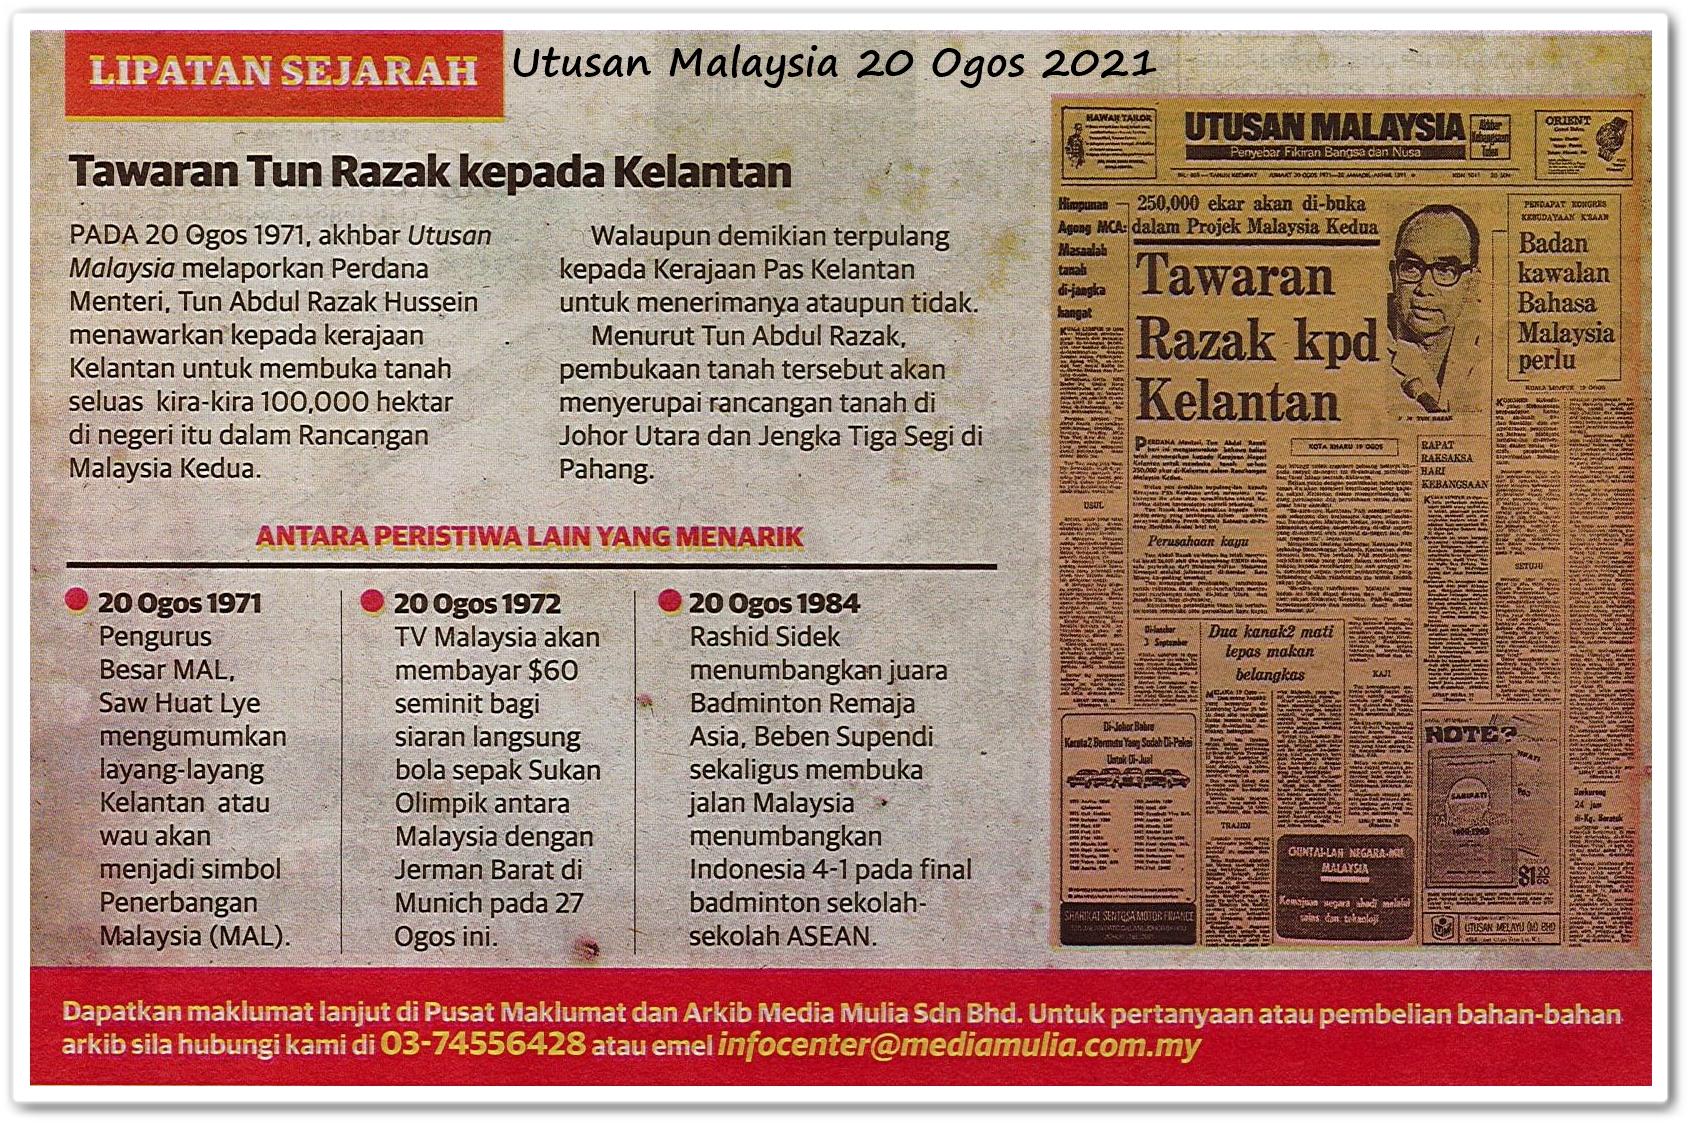 Lipatan sejarah 20 Ogos - Keratan akhbar Utusan Malaysia 20 Ogos 2021